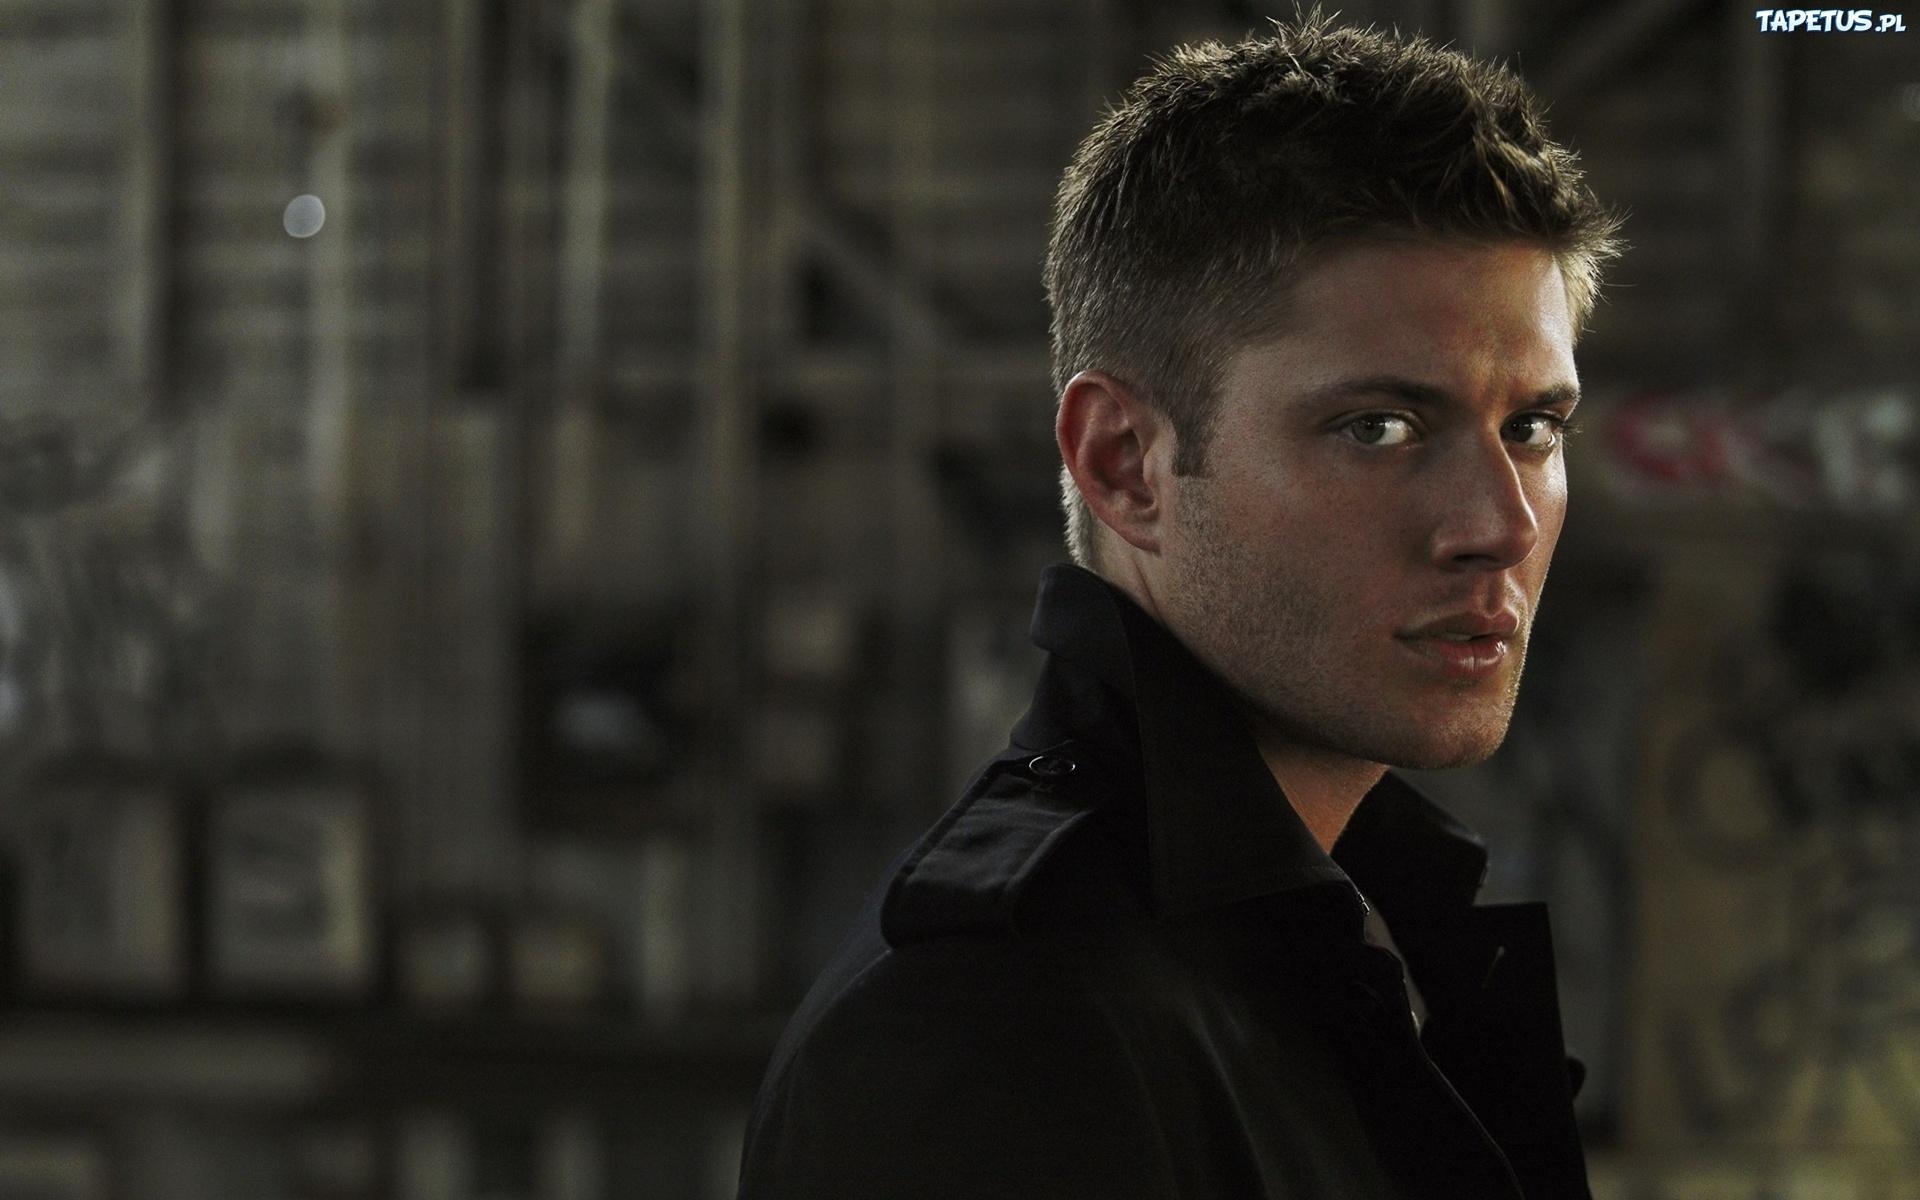 Jensen ackles, aktor, spojrzenie